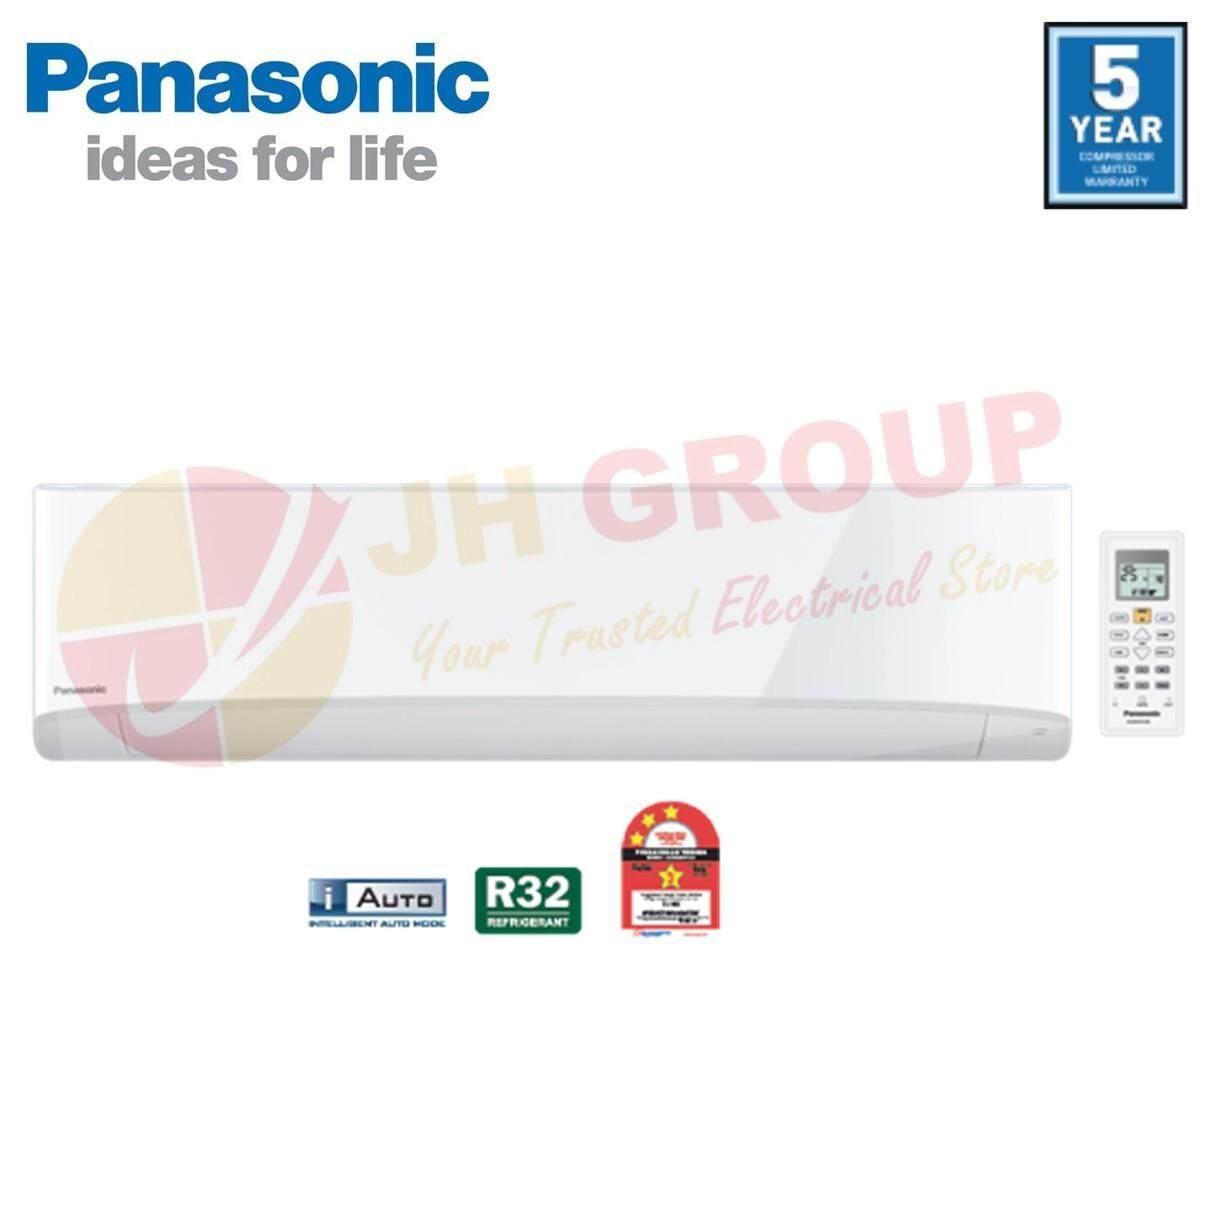 PANASONIC CS-PN24VKH / CU-PN24VKH 2.5 HP STANDARD NON-INVERTER R32 AERO SERIES AIR-CONDITIONER